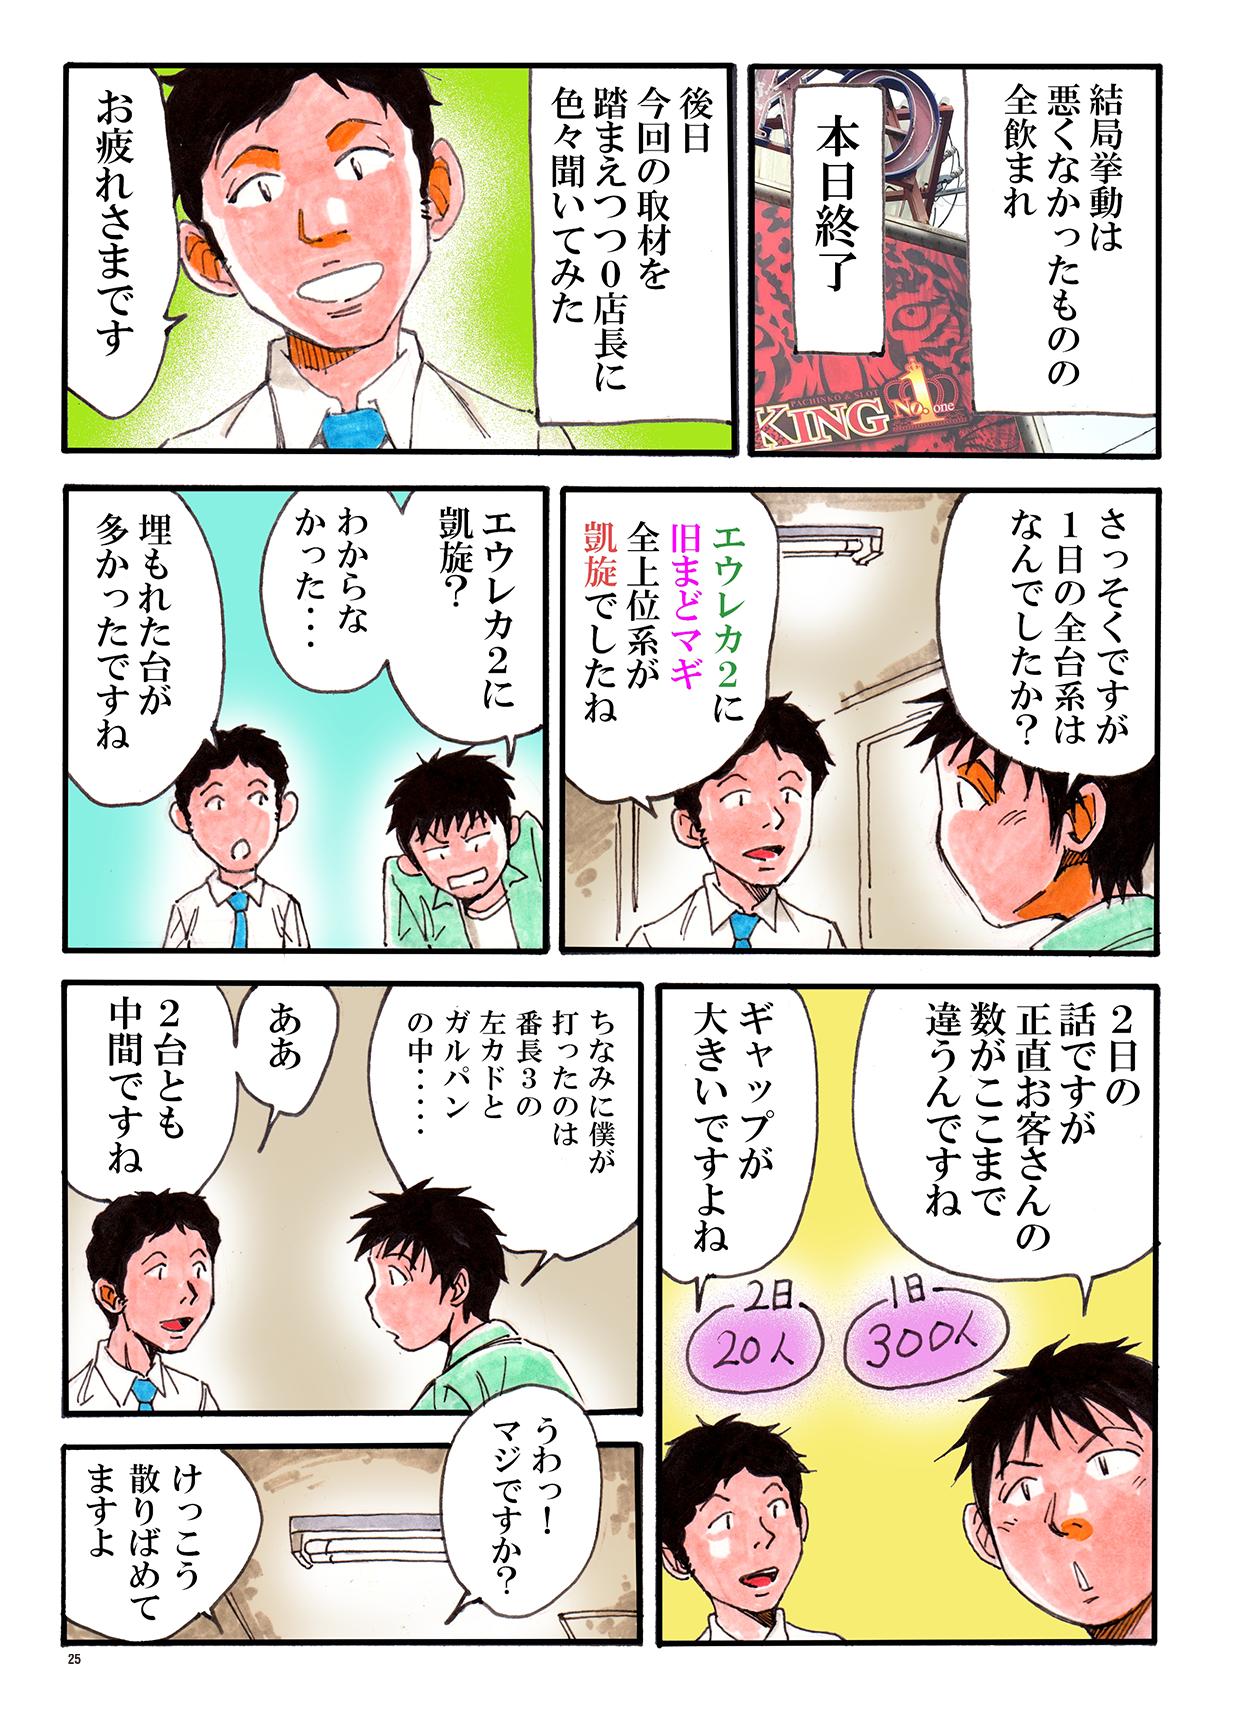 vol.4-5キング大解析